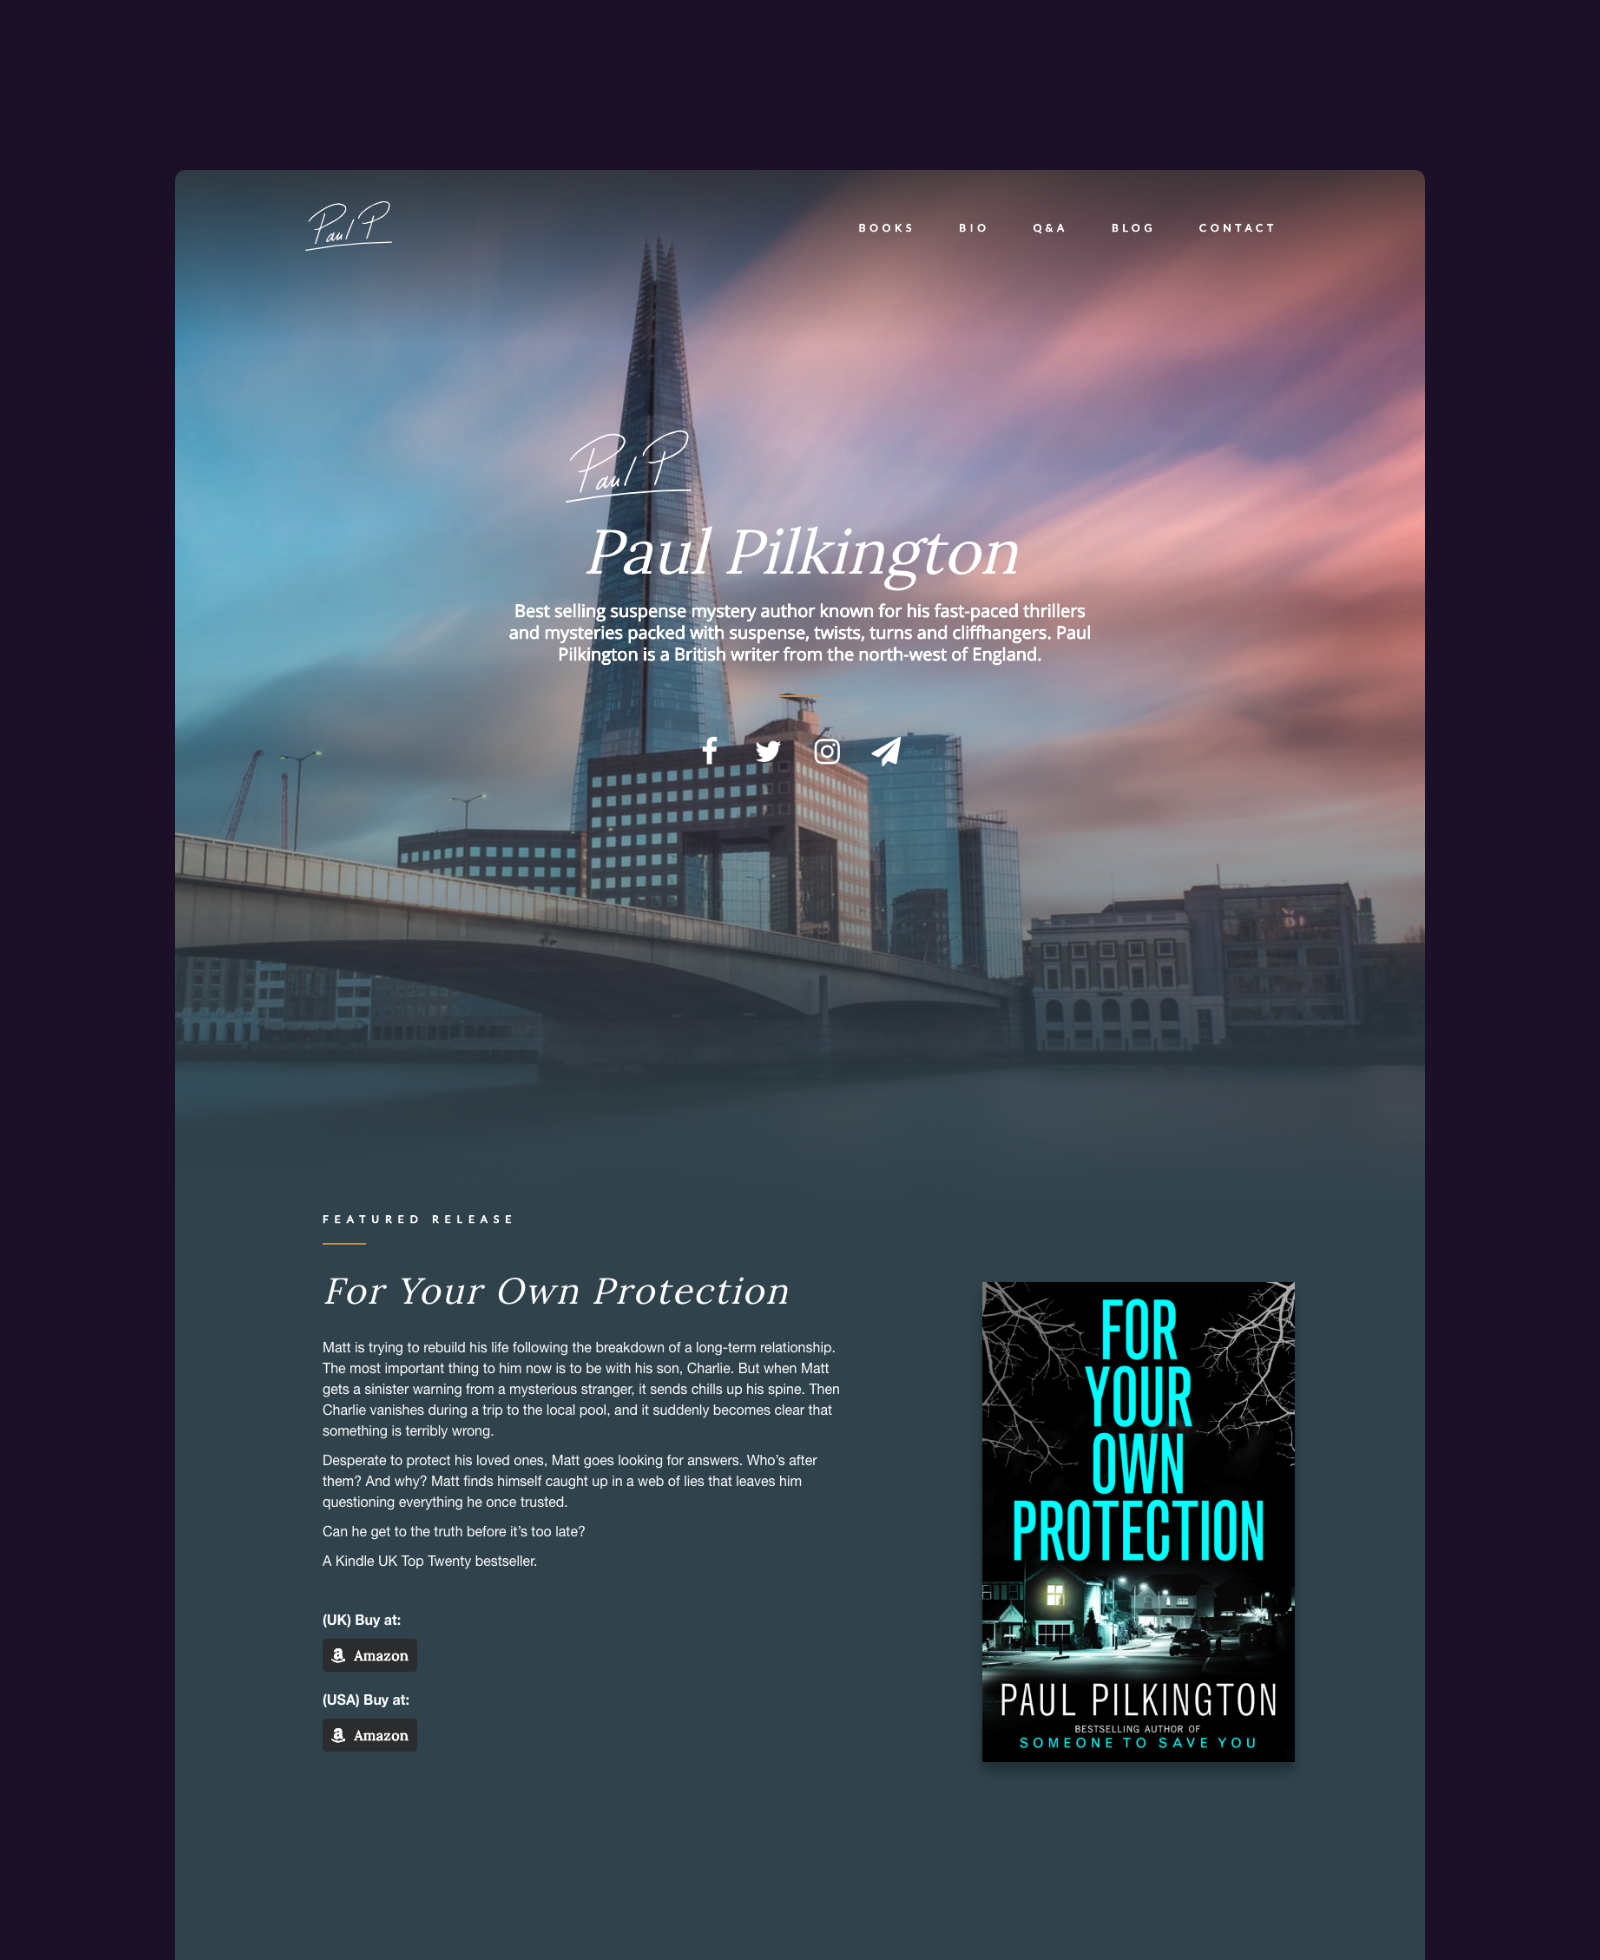 Paul Pilkington Home Page